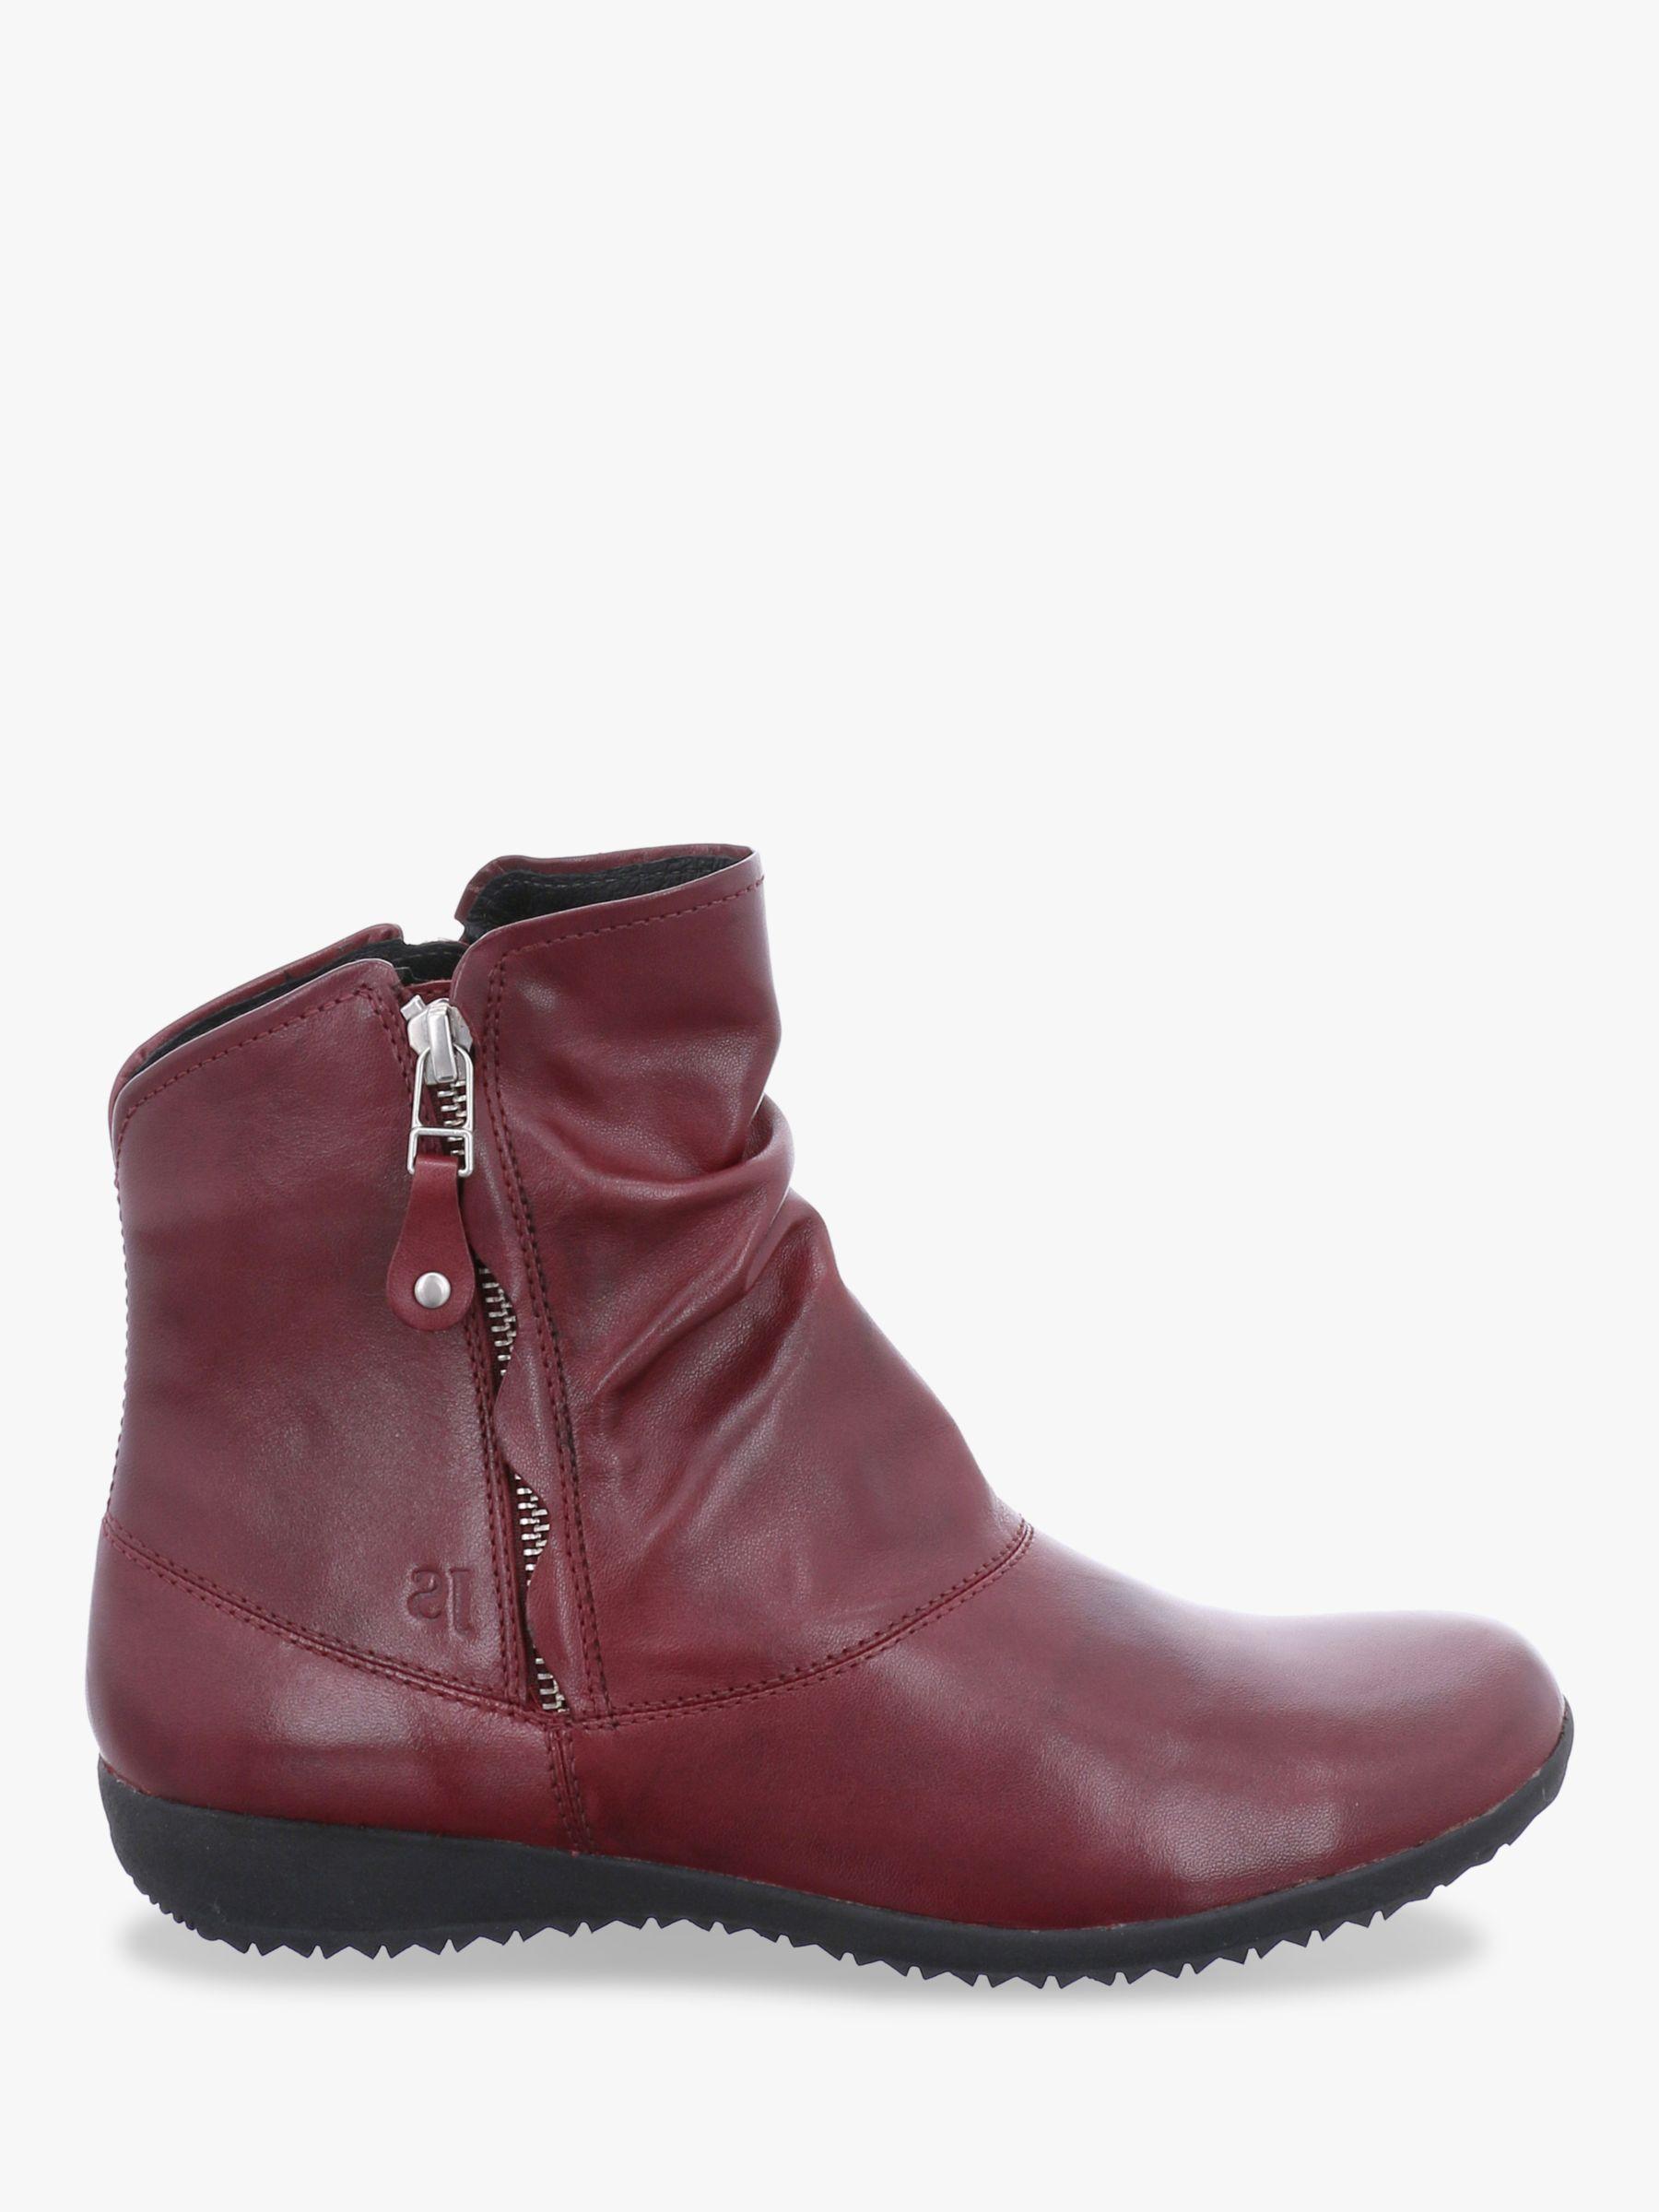 Josef Seibel Josef Seibel Naly 24 Leather Ankle Boots, Boro